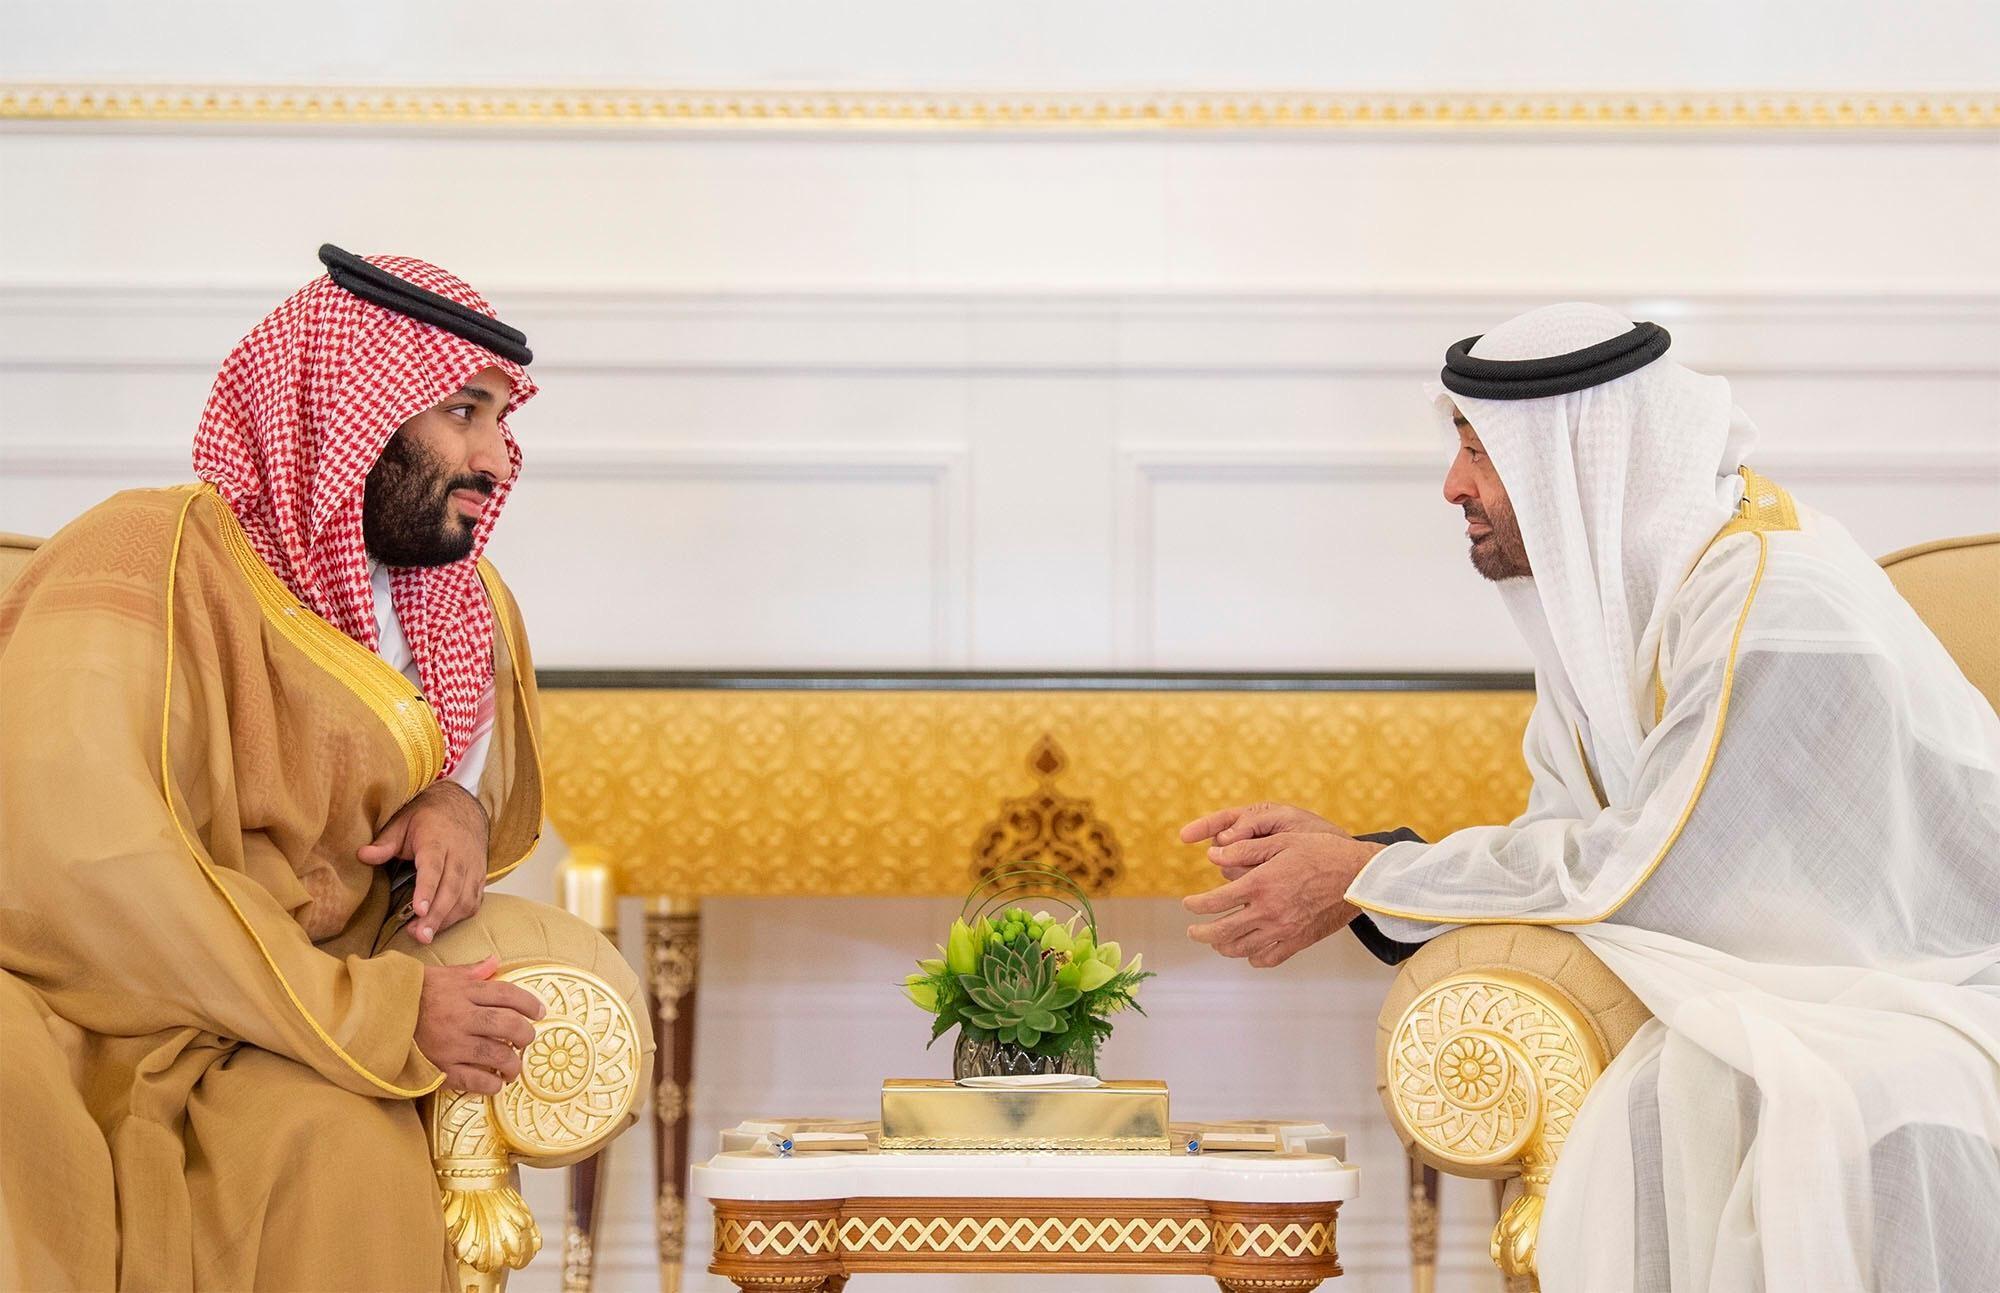 Abu Dhabi's Crown Prince Sheikh Mohammed bin Zayed al-Nahyan talks with Saudi Arabia's Crown Prince Mohammed bin Salman Al Saud in Abu Dhabi, UAE, November 22, 2018.